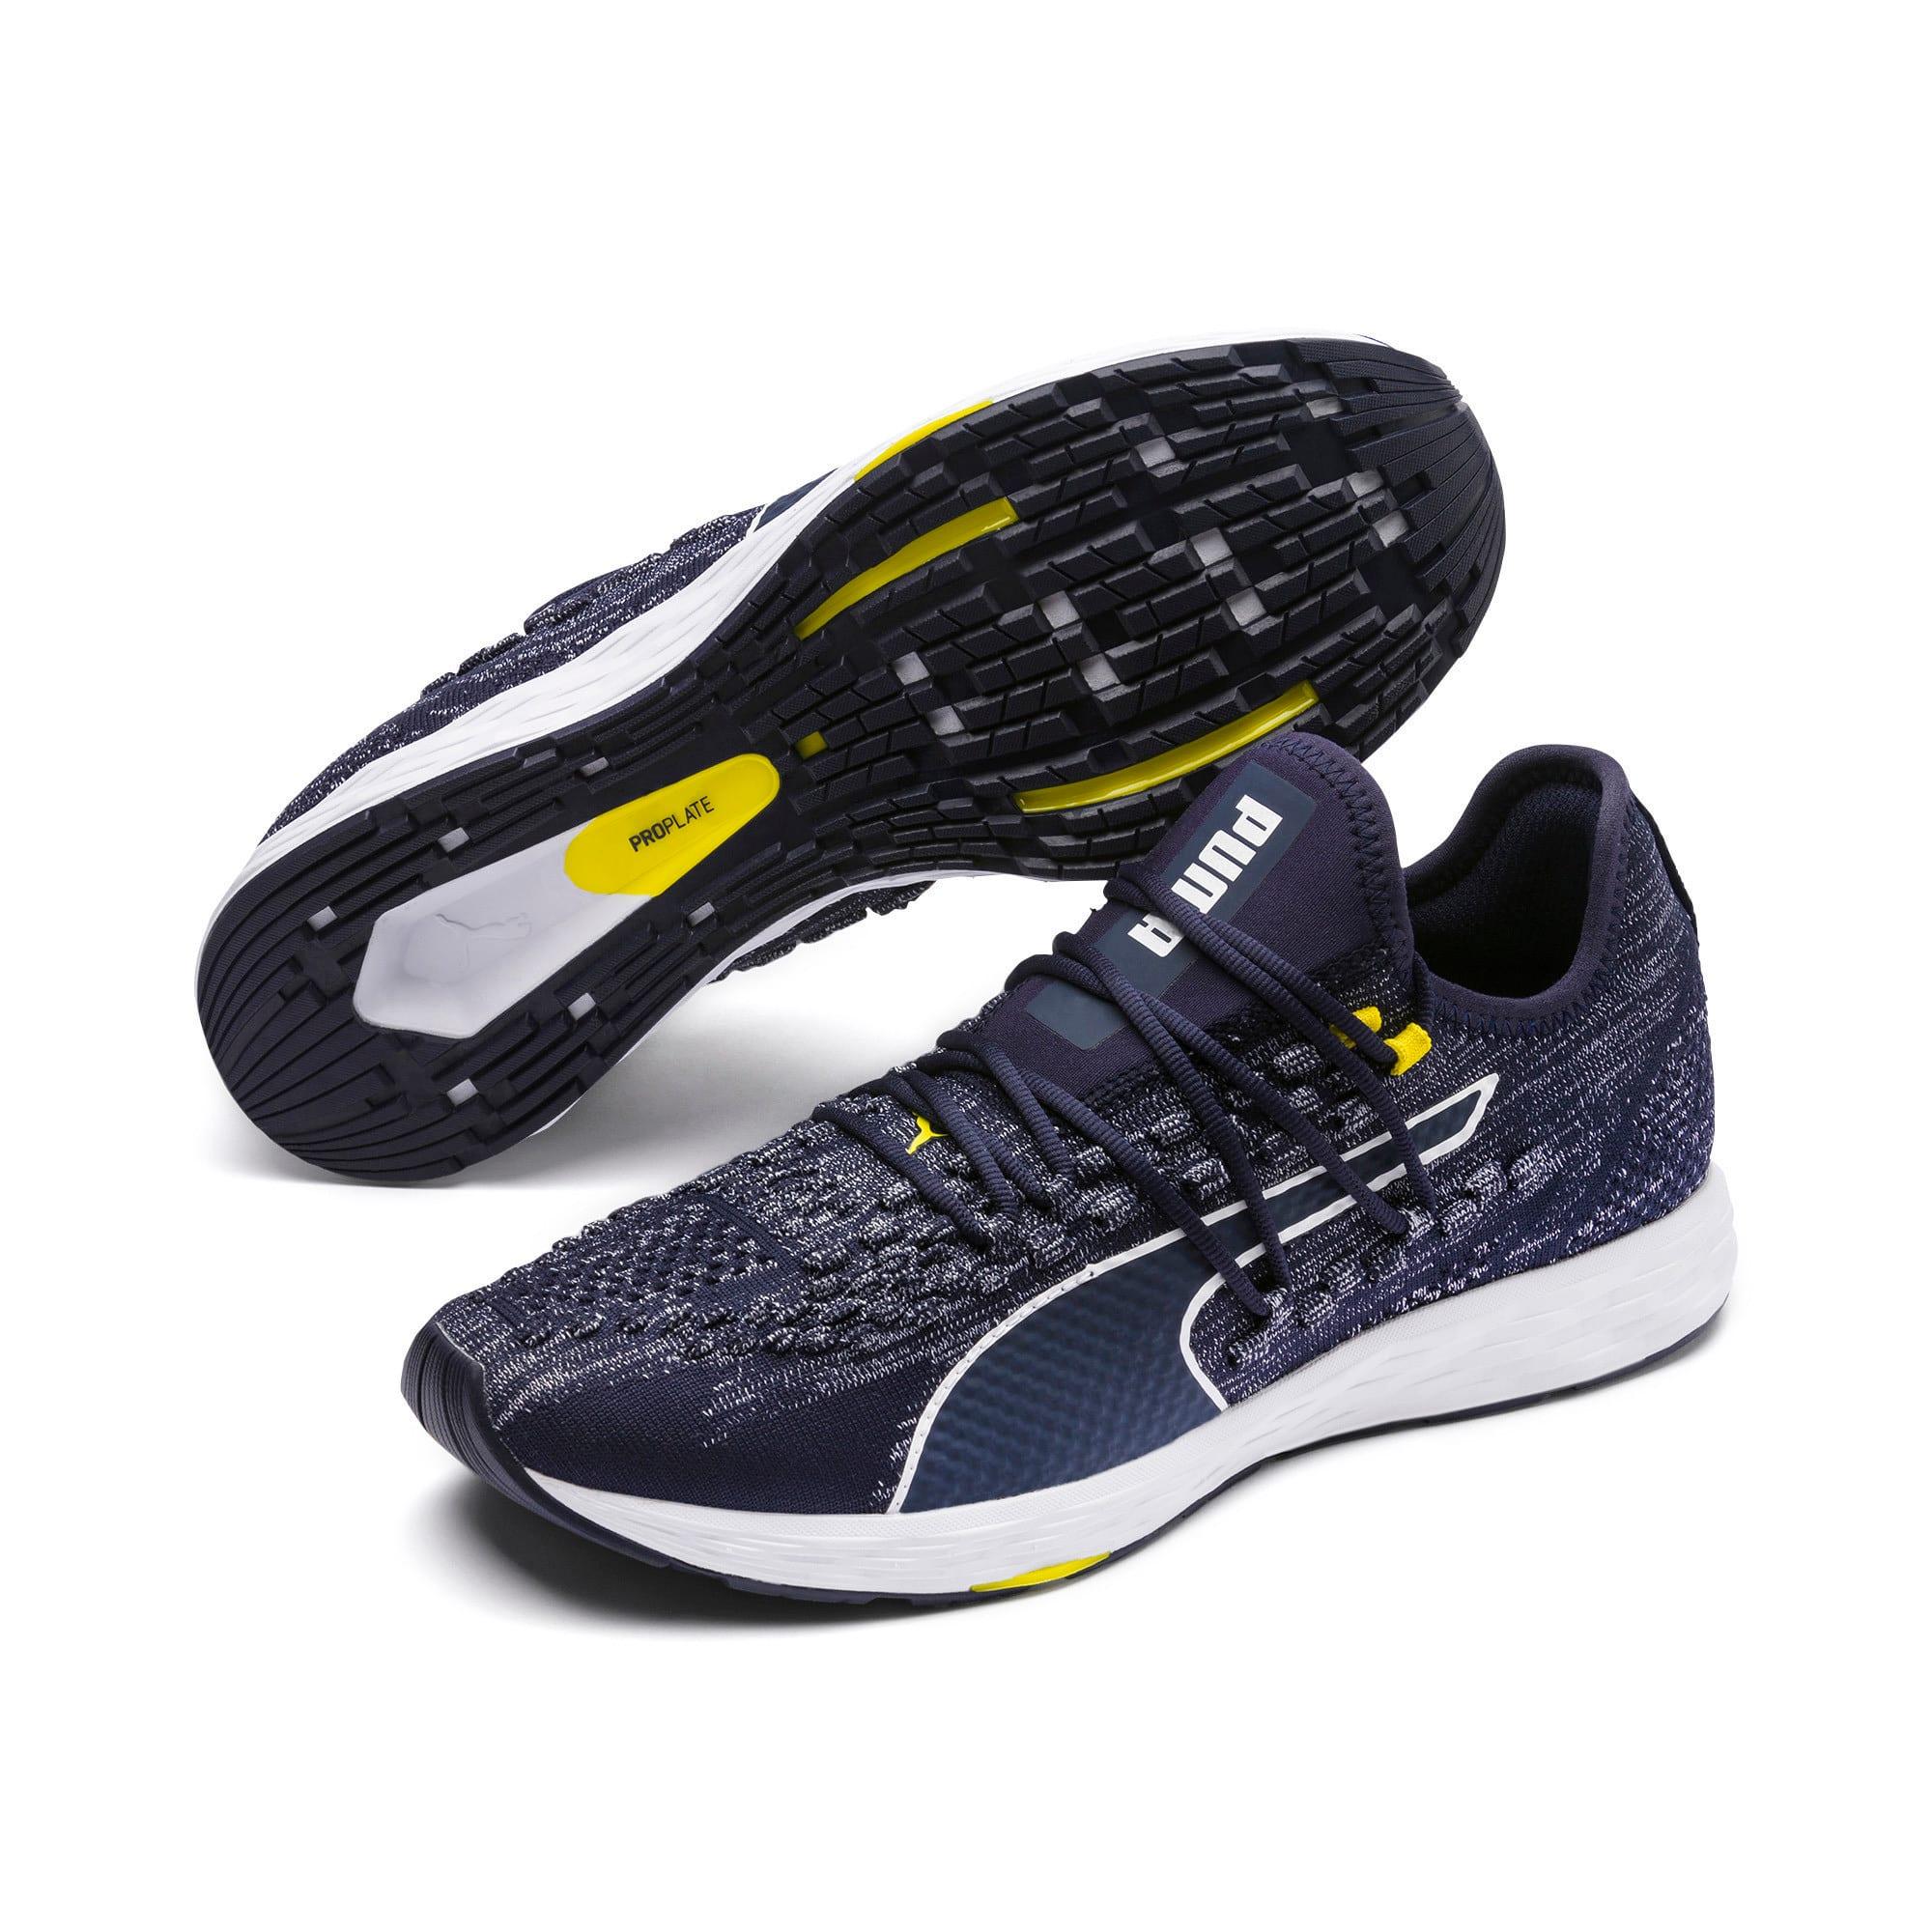 Thumbnail 2 of SPEED RACER Men's Running Shoes, Peacoat-White-Blazing Yellow, medium-IND